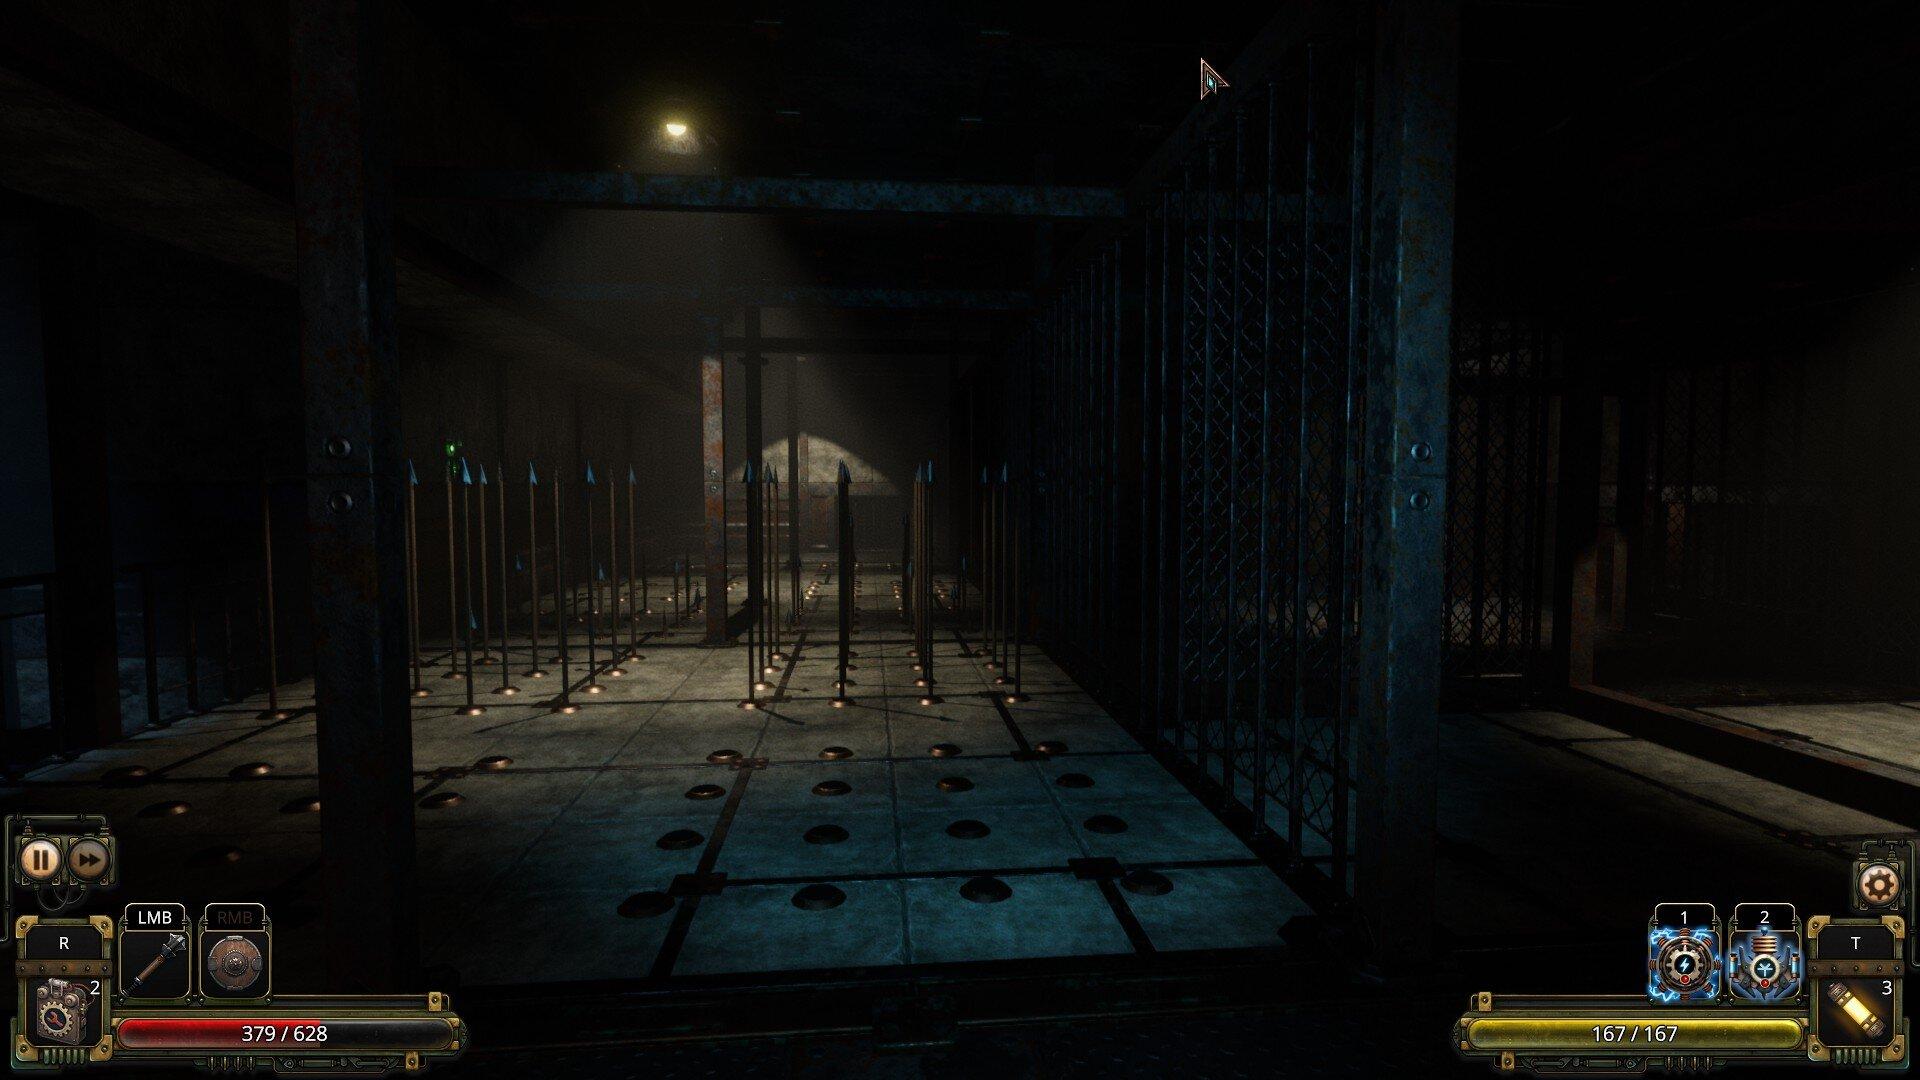 Vaporum game screenshot, spikes